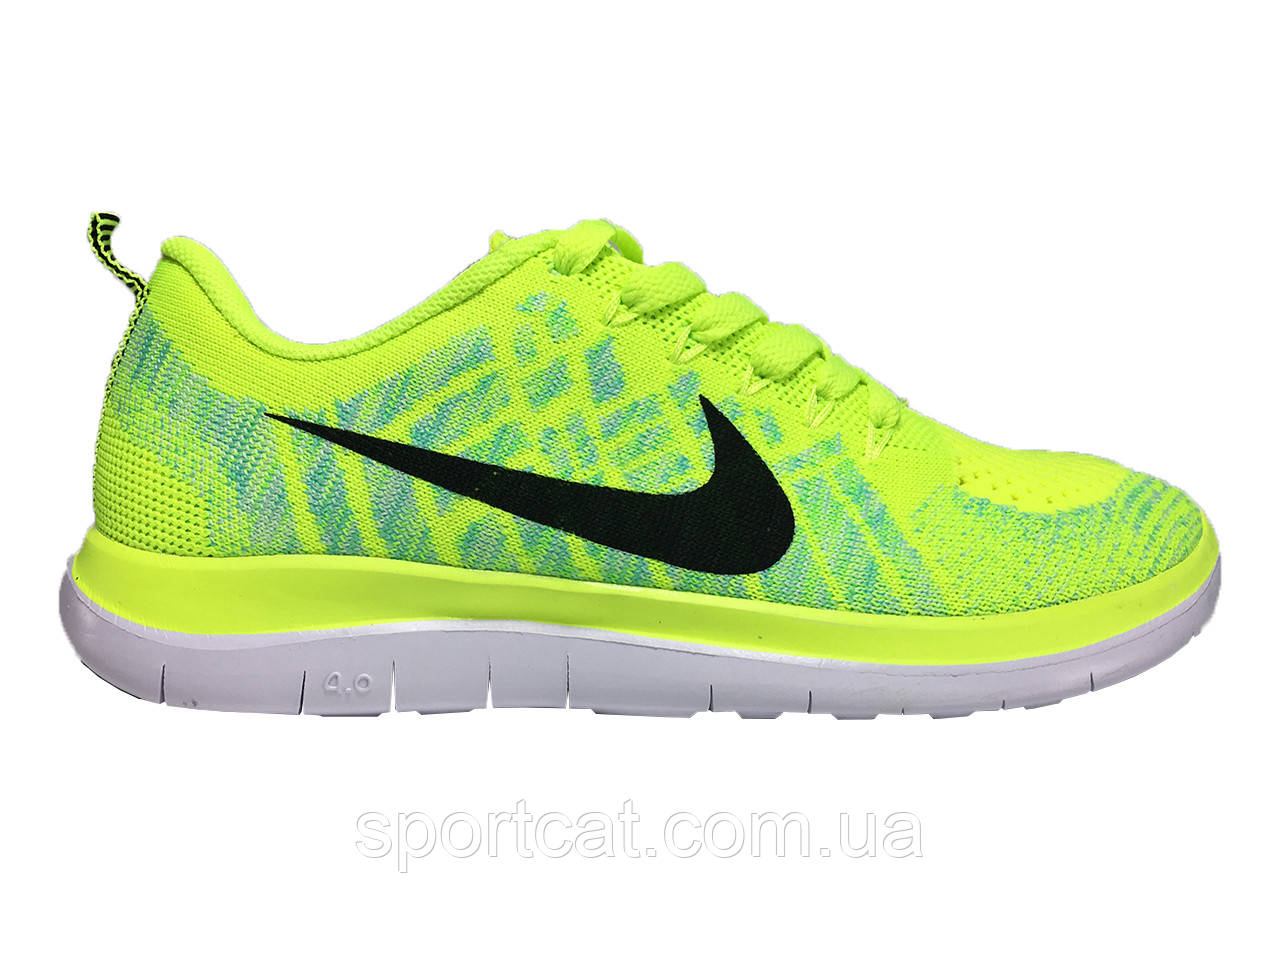 cc66355f Женские беговые кроссовки Nike Free Run 3.0 V5, Р. 37 39 от интернет ...